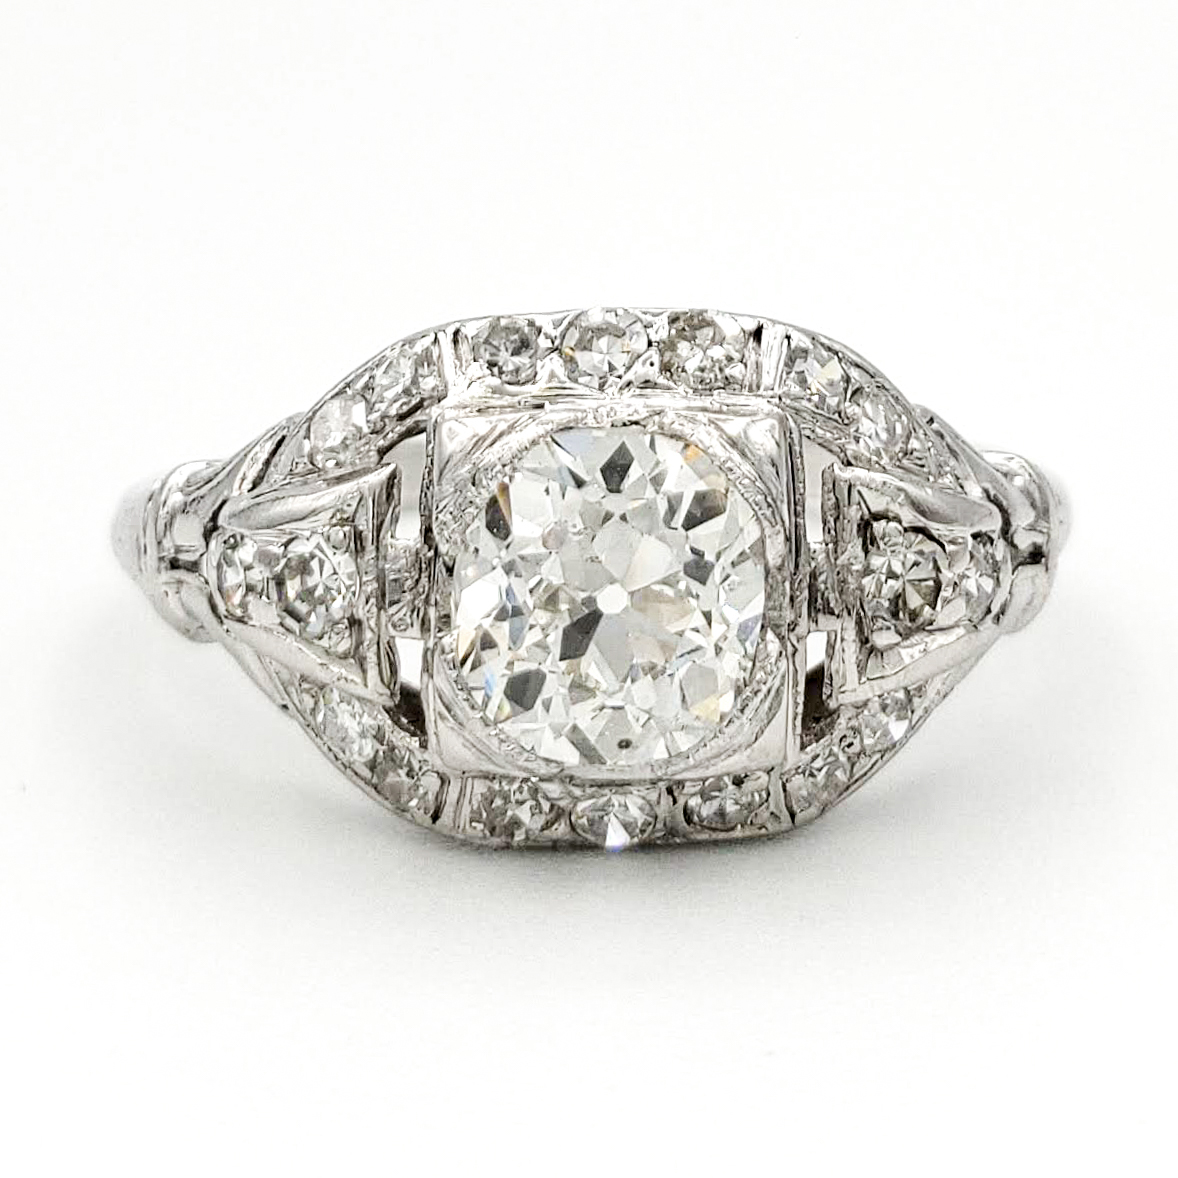 vintage-platinum-engagement-ring-with-0-84-carat-old-european-cut-diamond-egl-g-si1